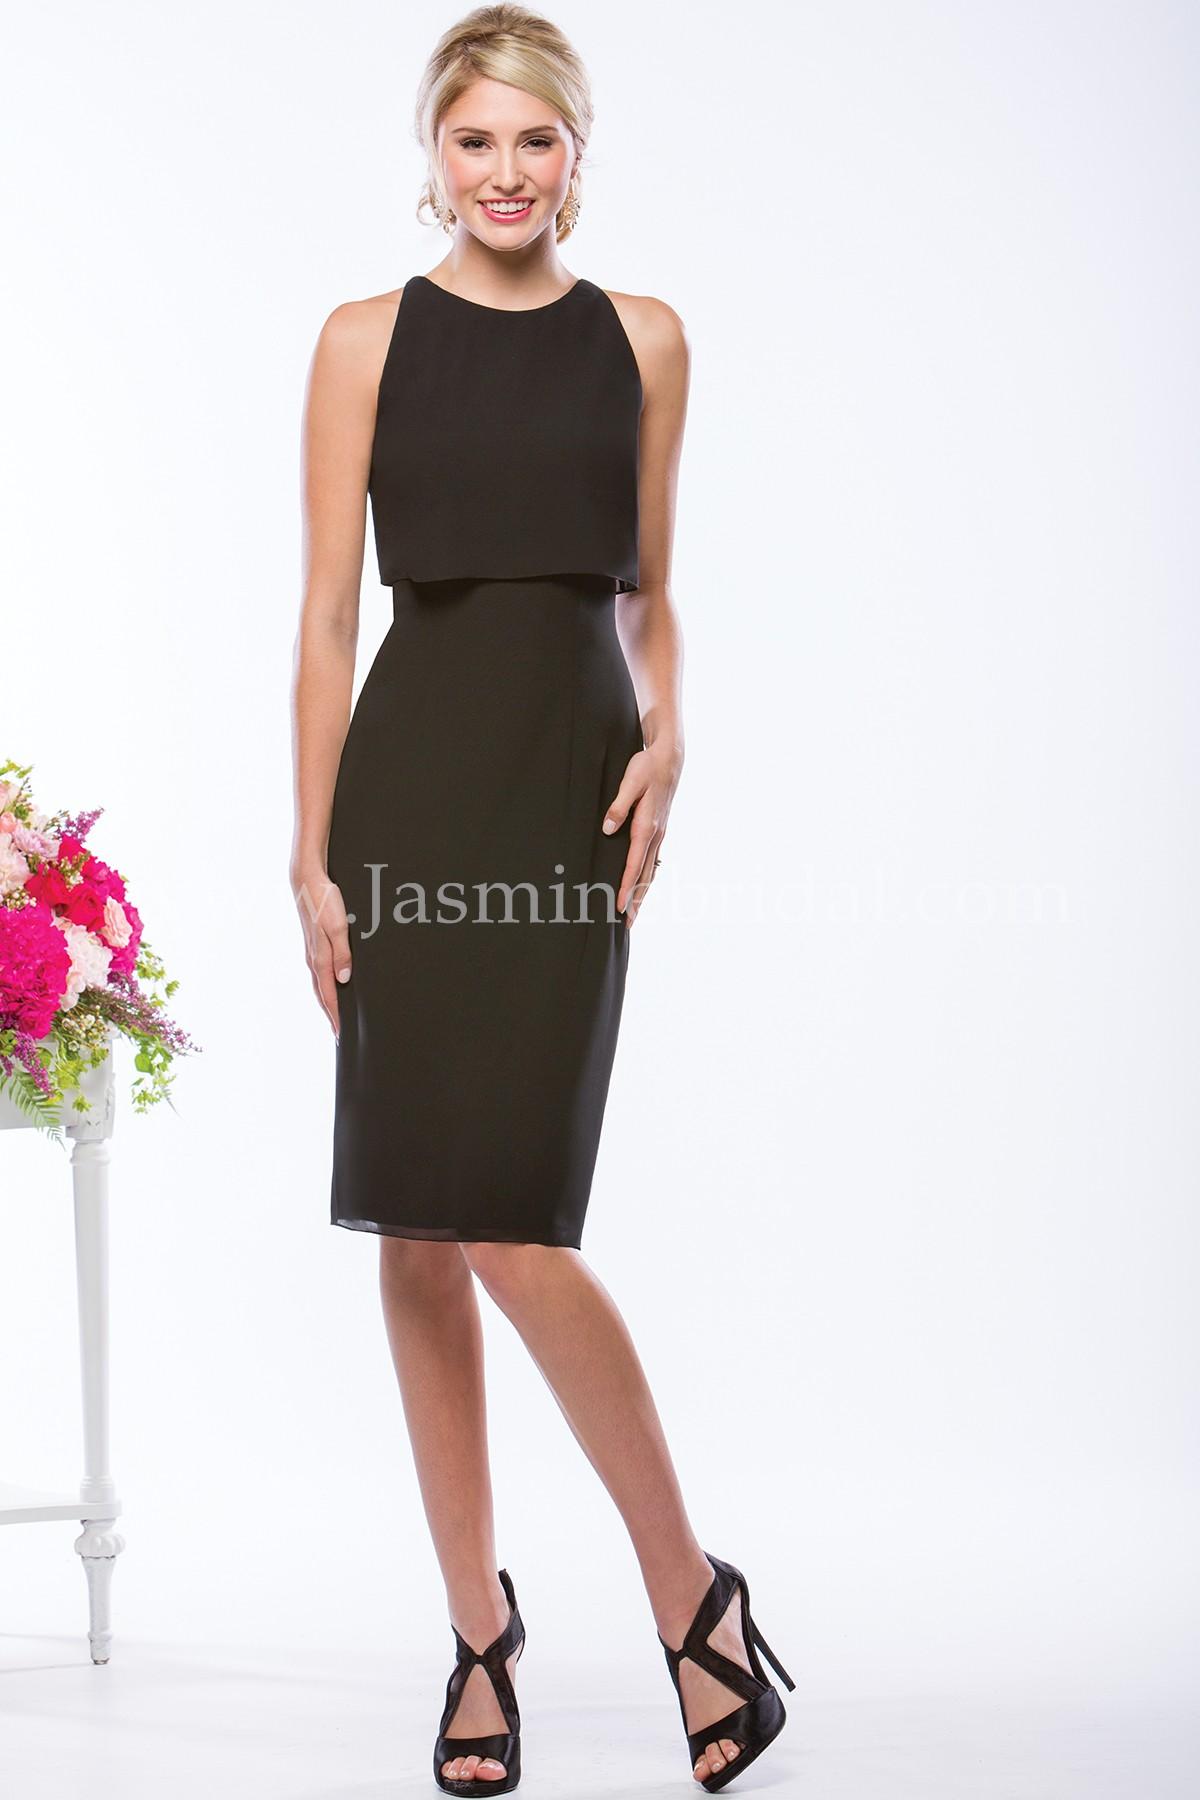 Jasmine bridal shop designer wedding dresses ombrellifo Images